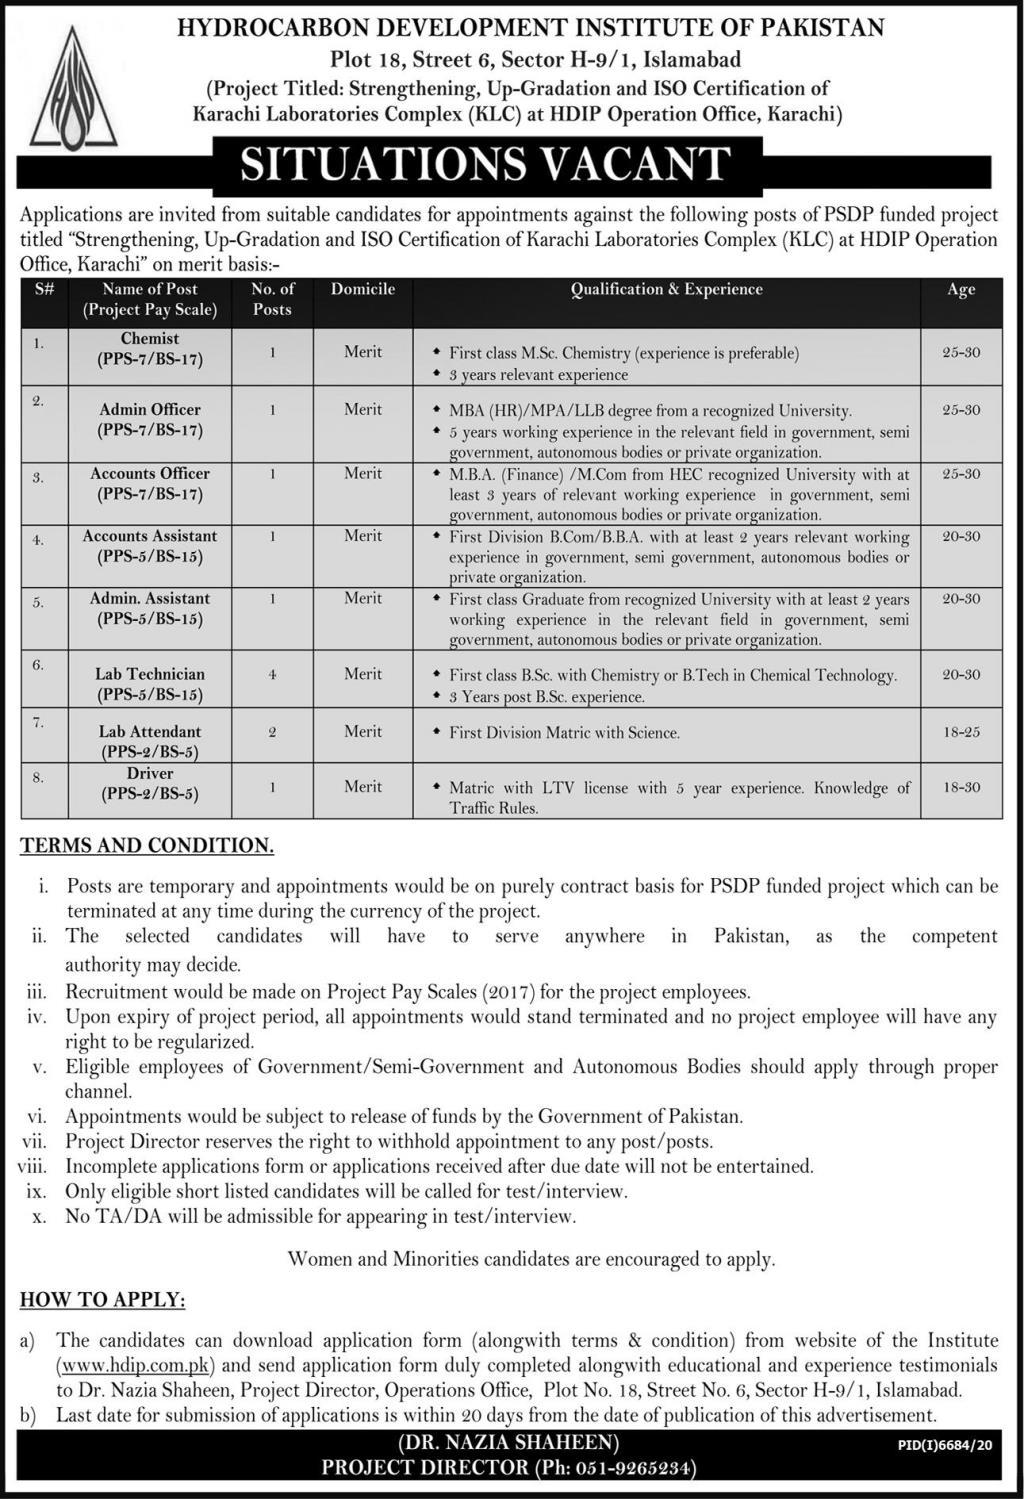 Latest Hydrocarbon Development Institute of Pakistan HDIP Jobs 2021